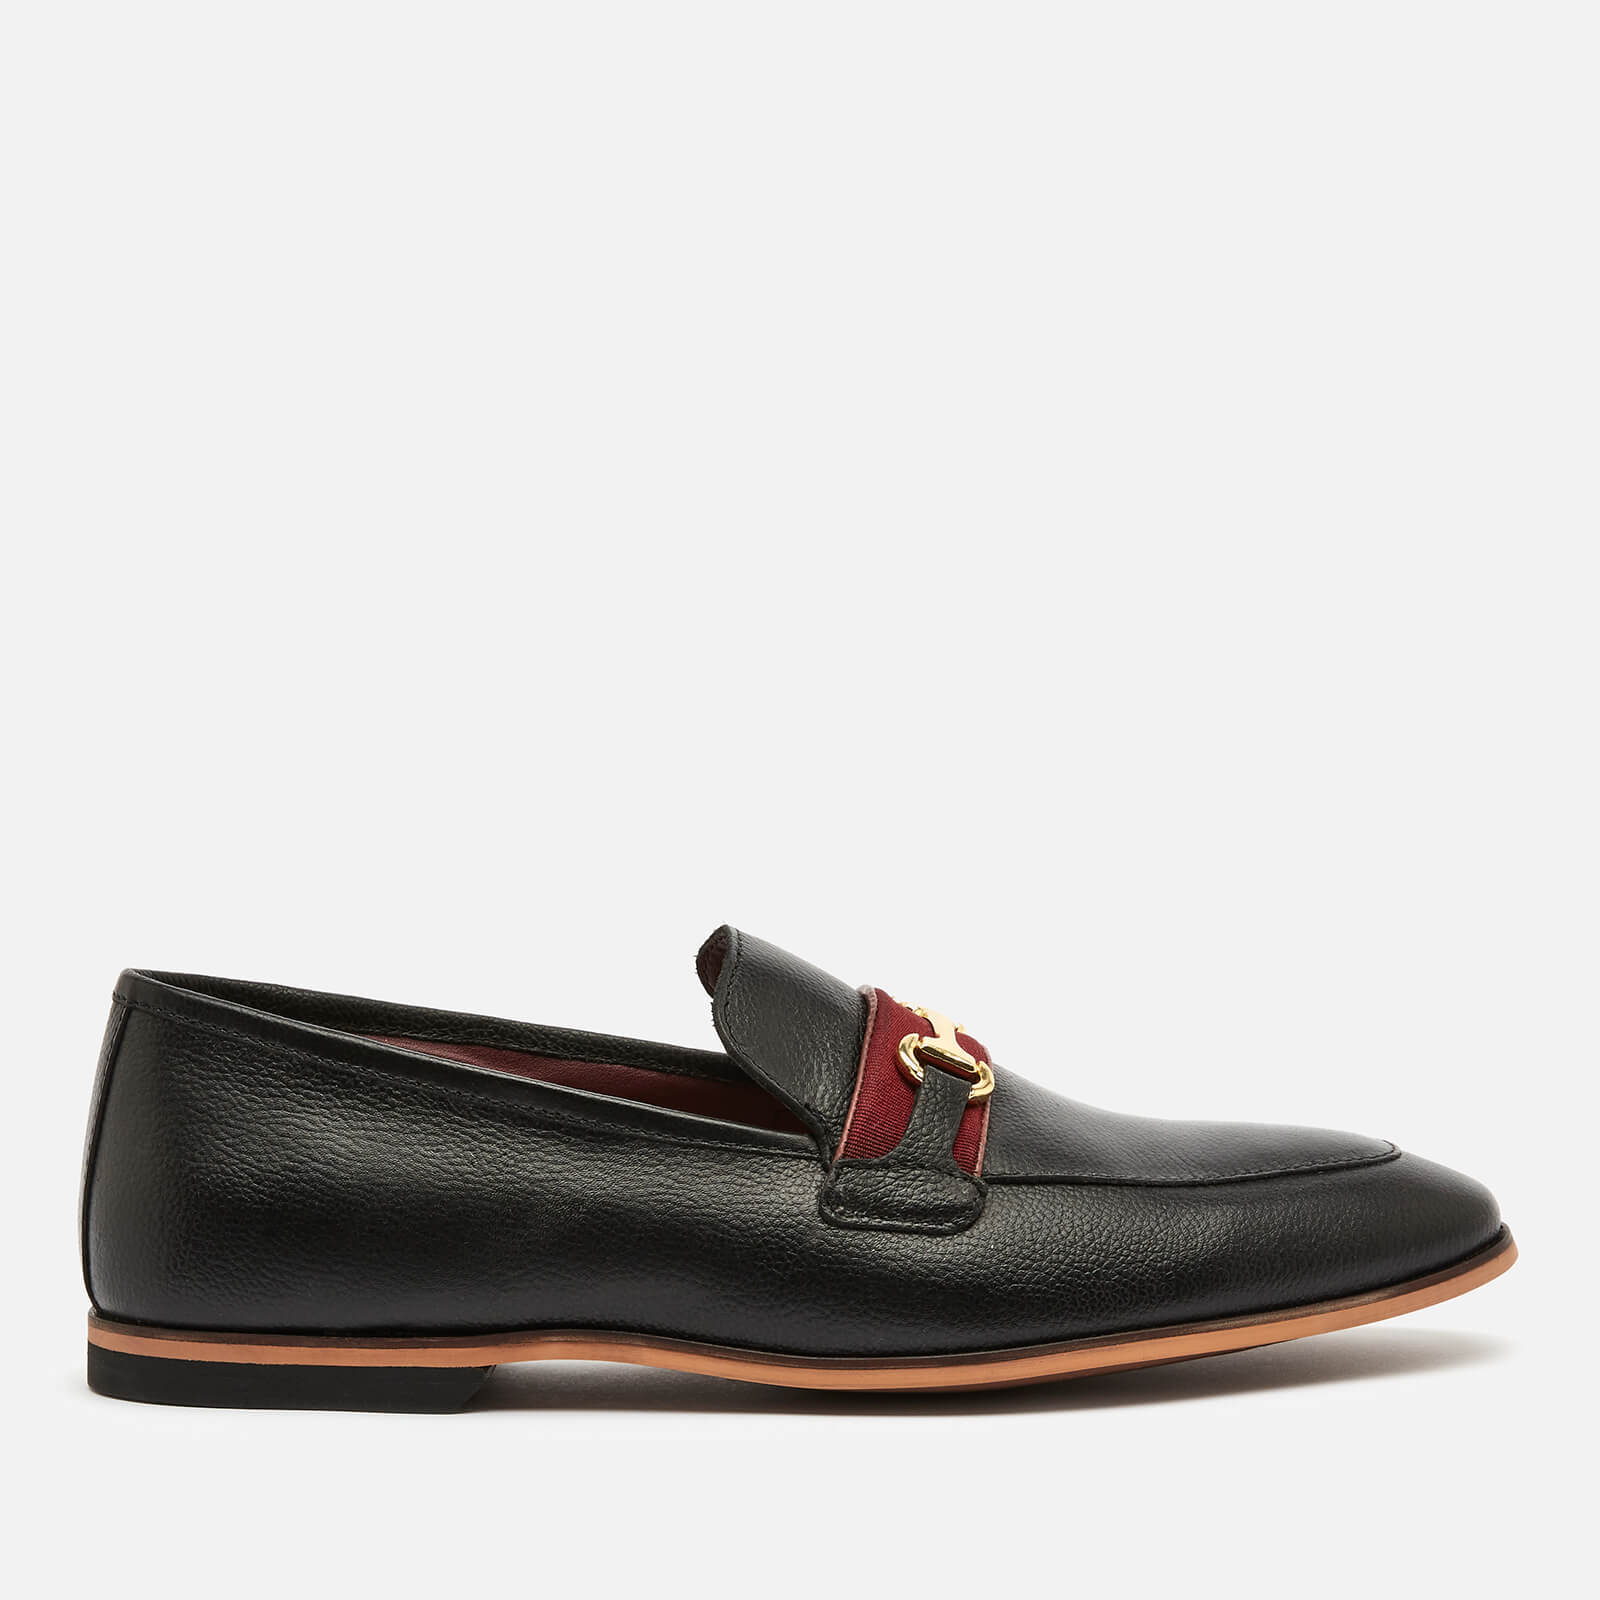 Walk London Men's Raphael Leather Loafers - Black/Burgundy - UK 7